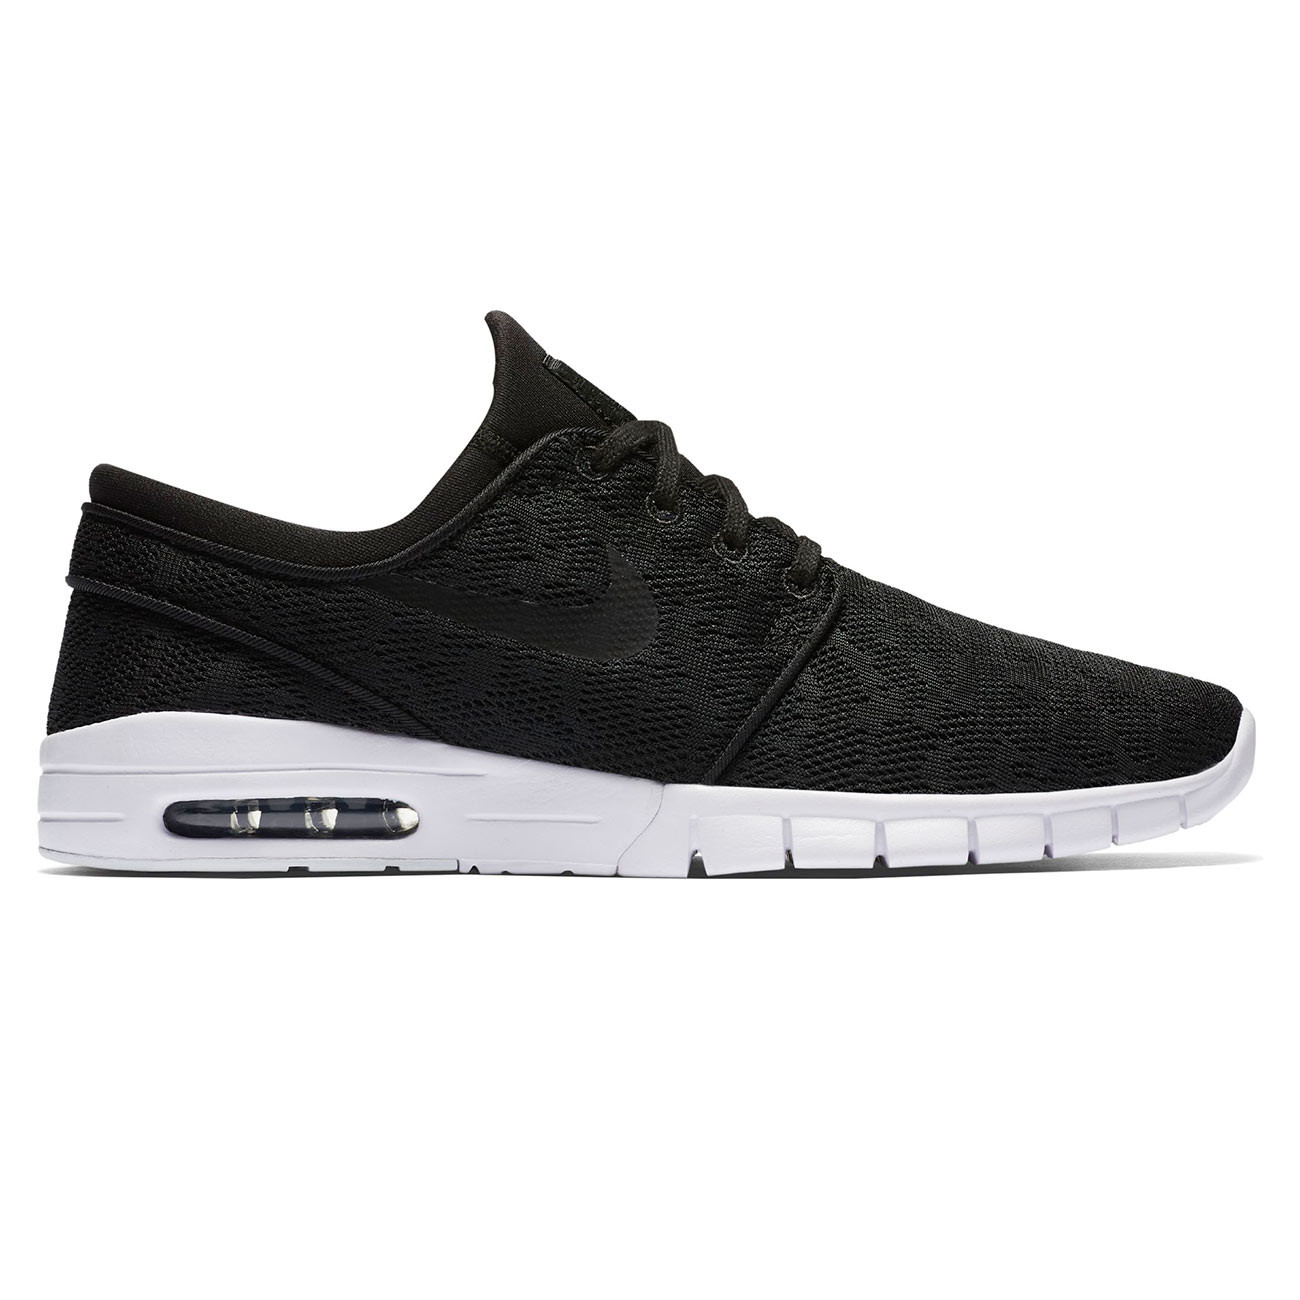 Tenisky Nike SB Stefan Janoski Max black/black-white